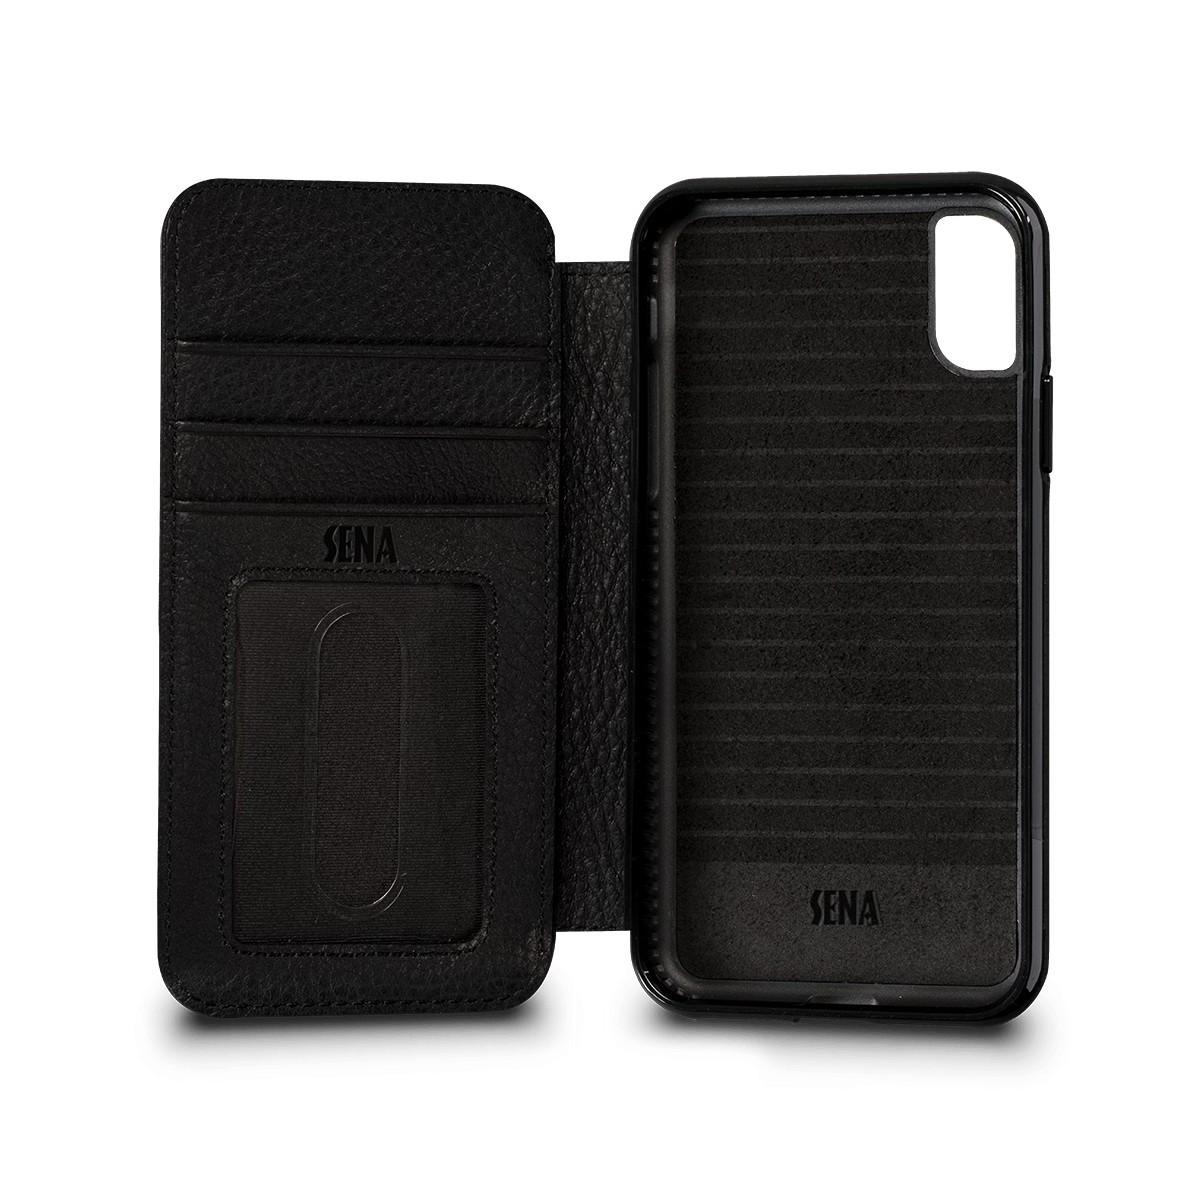 Etui iPhone Xs / iPhone X en cuir véritable porte-cartes noir - Sena Cases